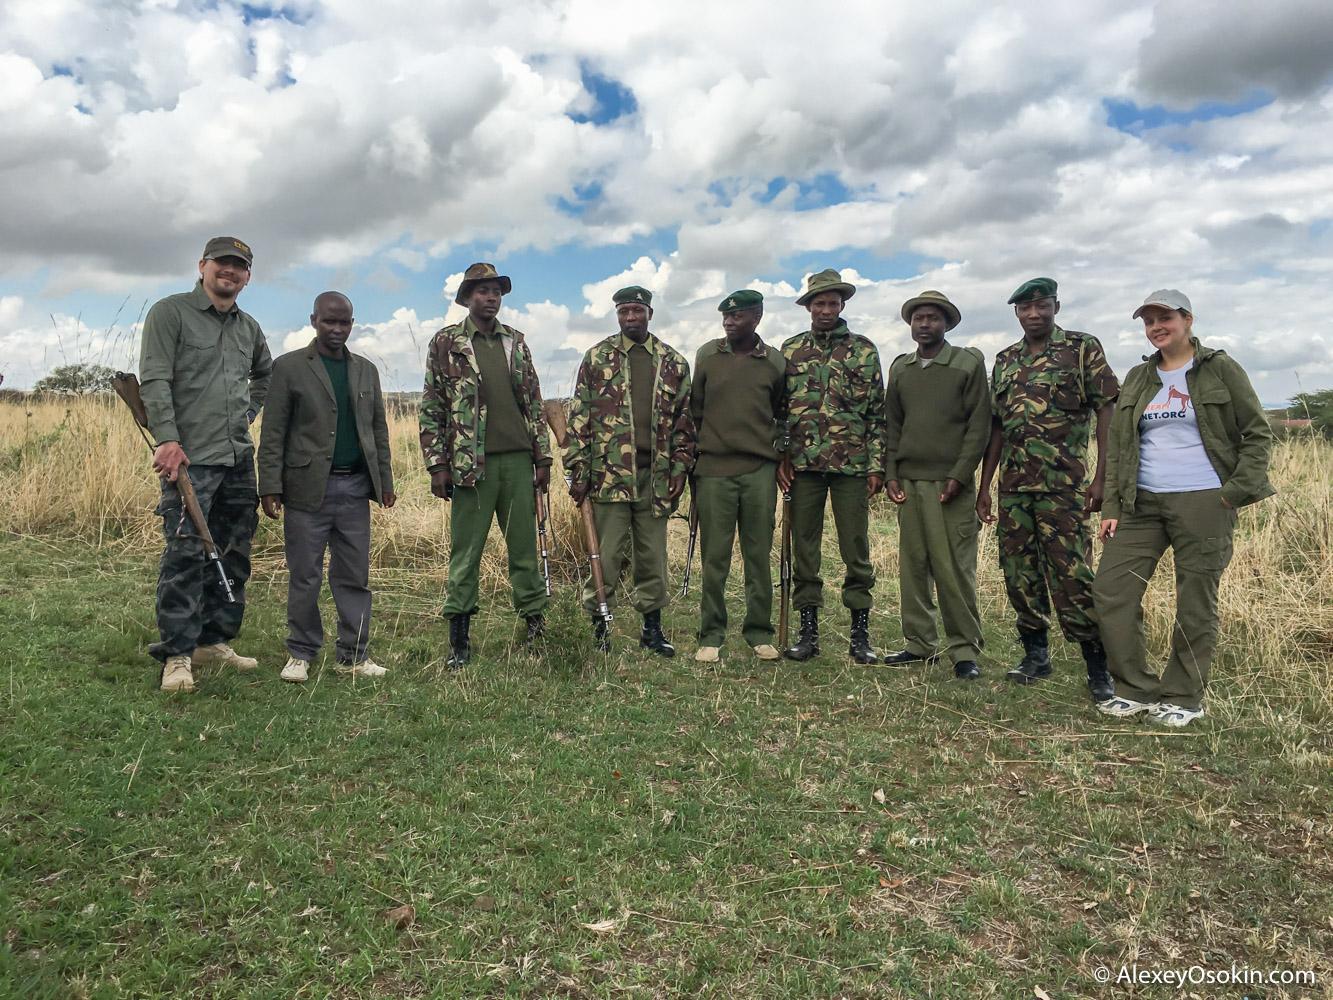 Наша служба и опасна, и трудна. Блогер на защите дикой природы.